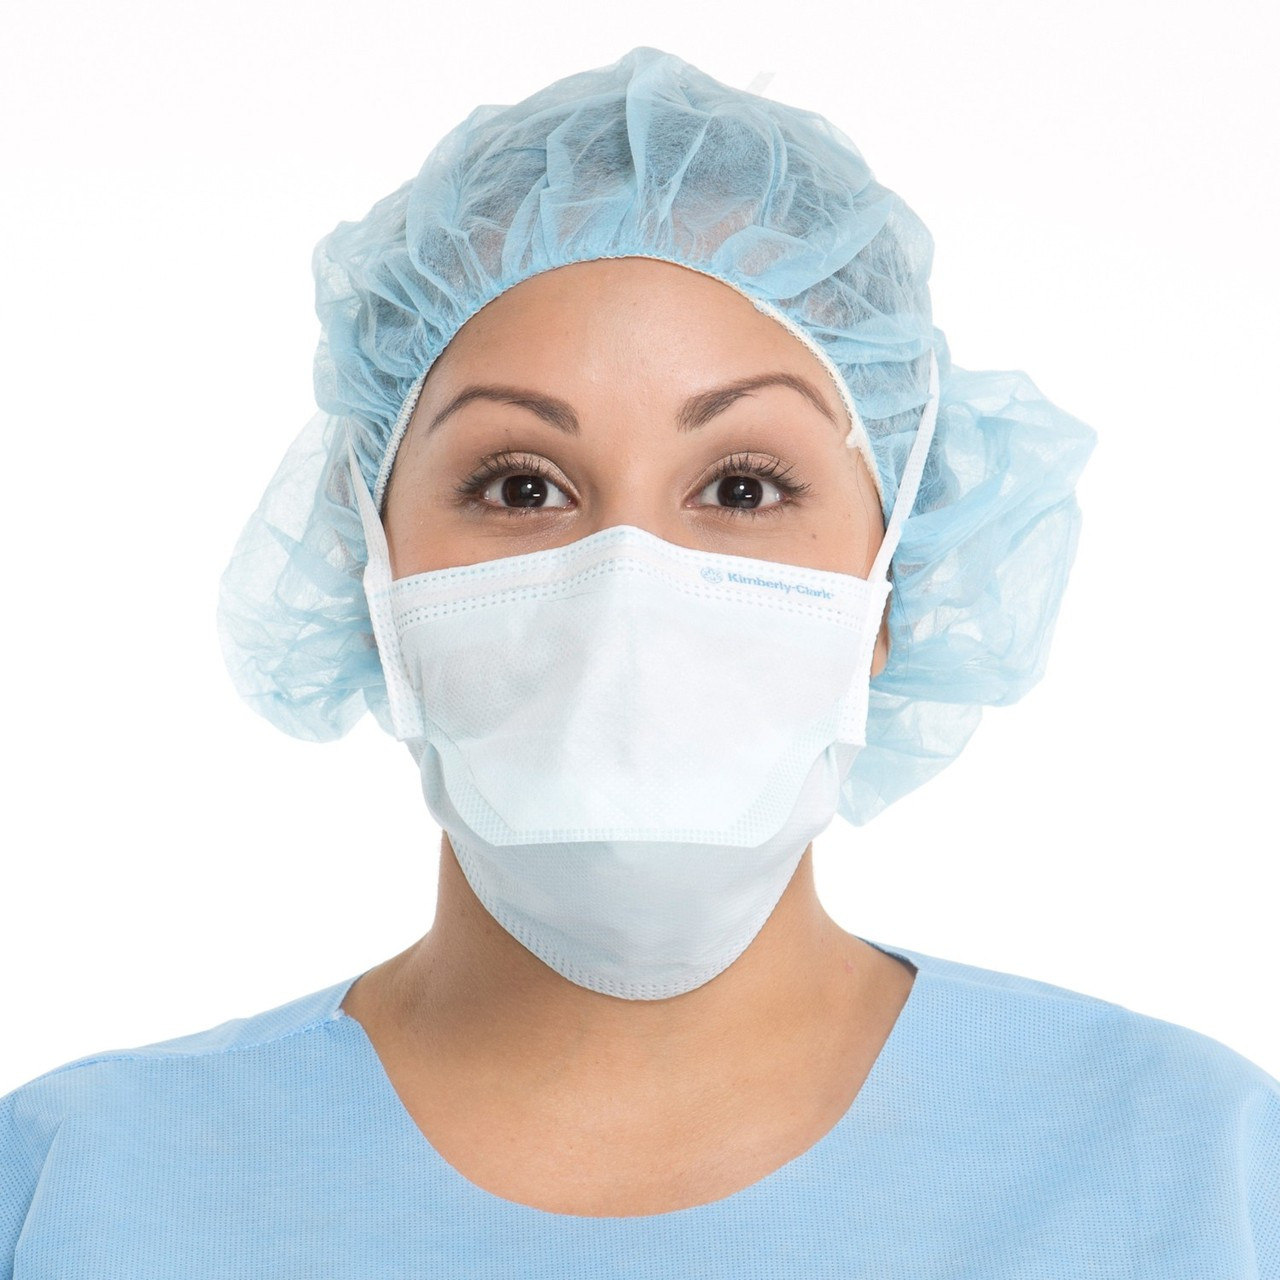 medical-surgical mask